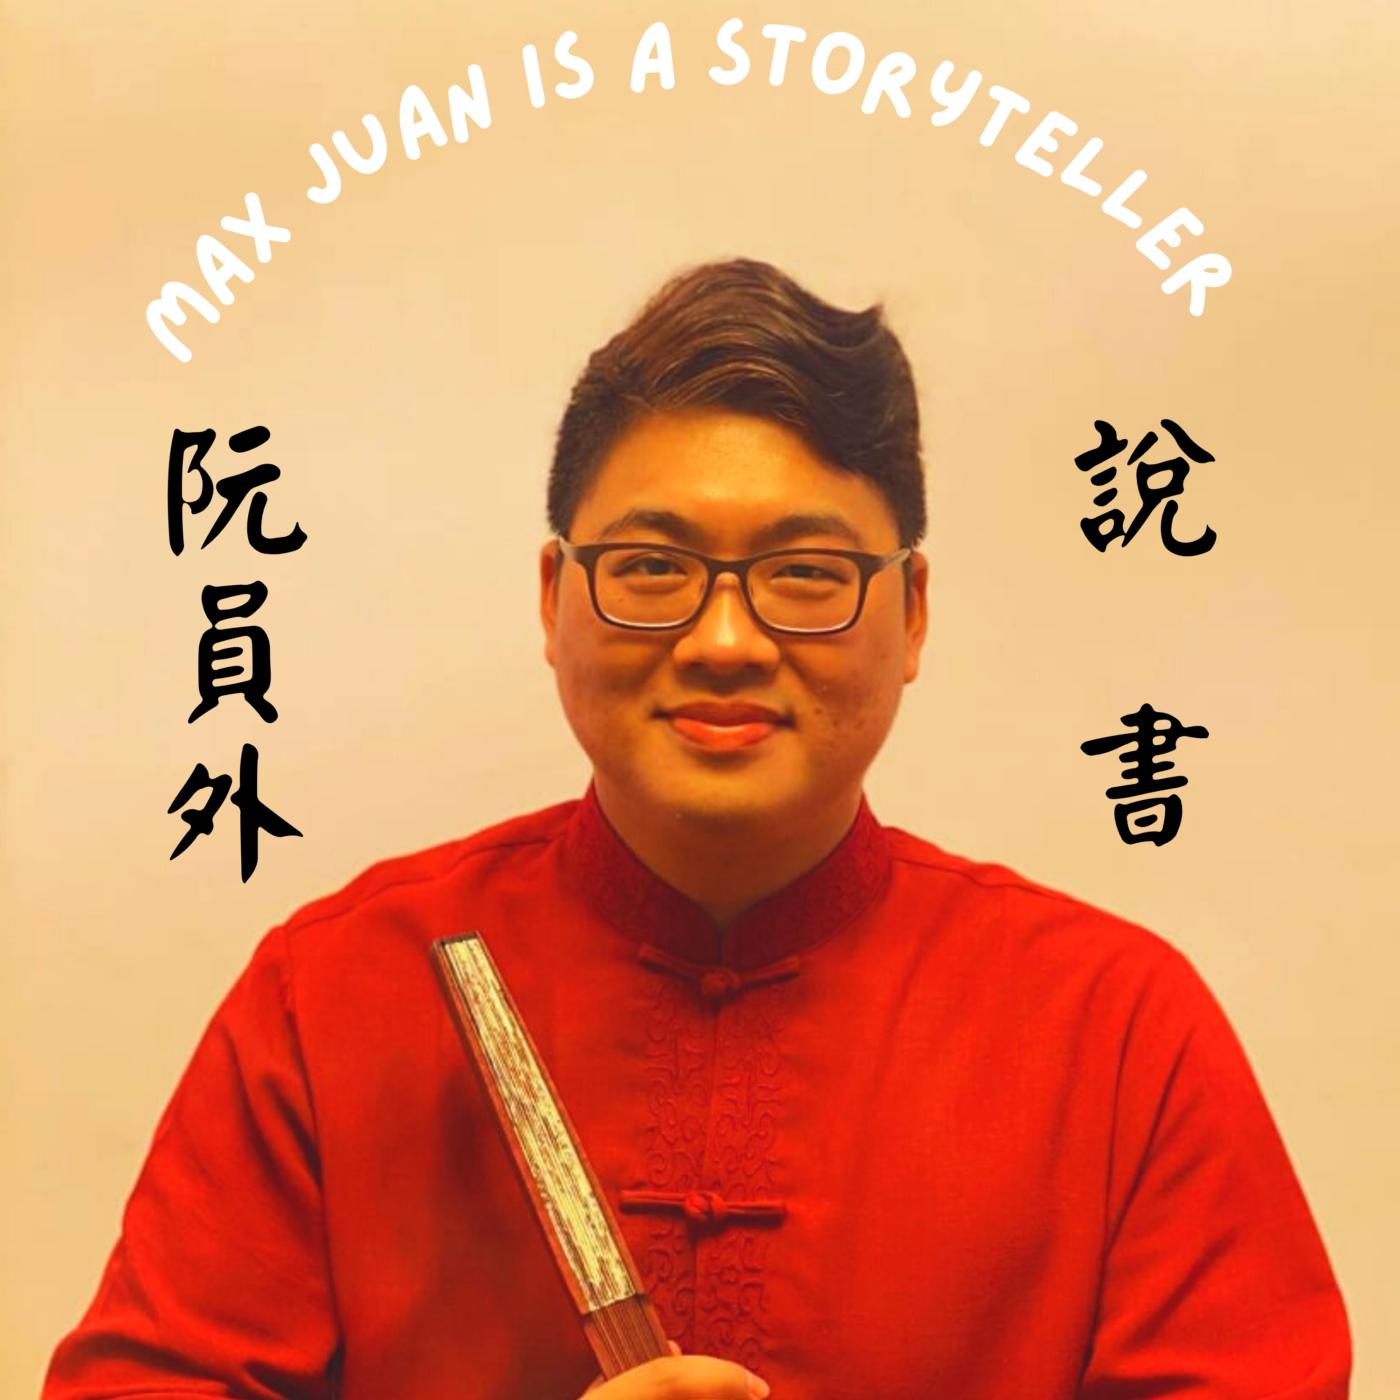 阮員外說書 Max Juan is a Storyteller